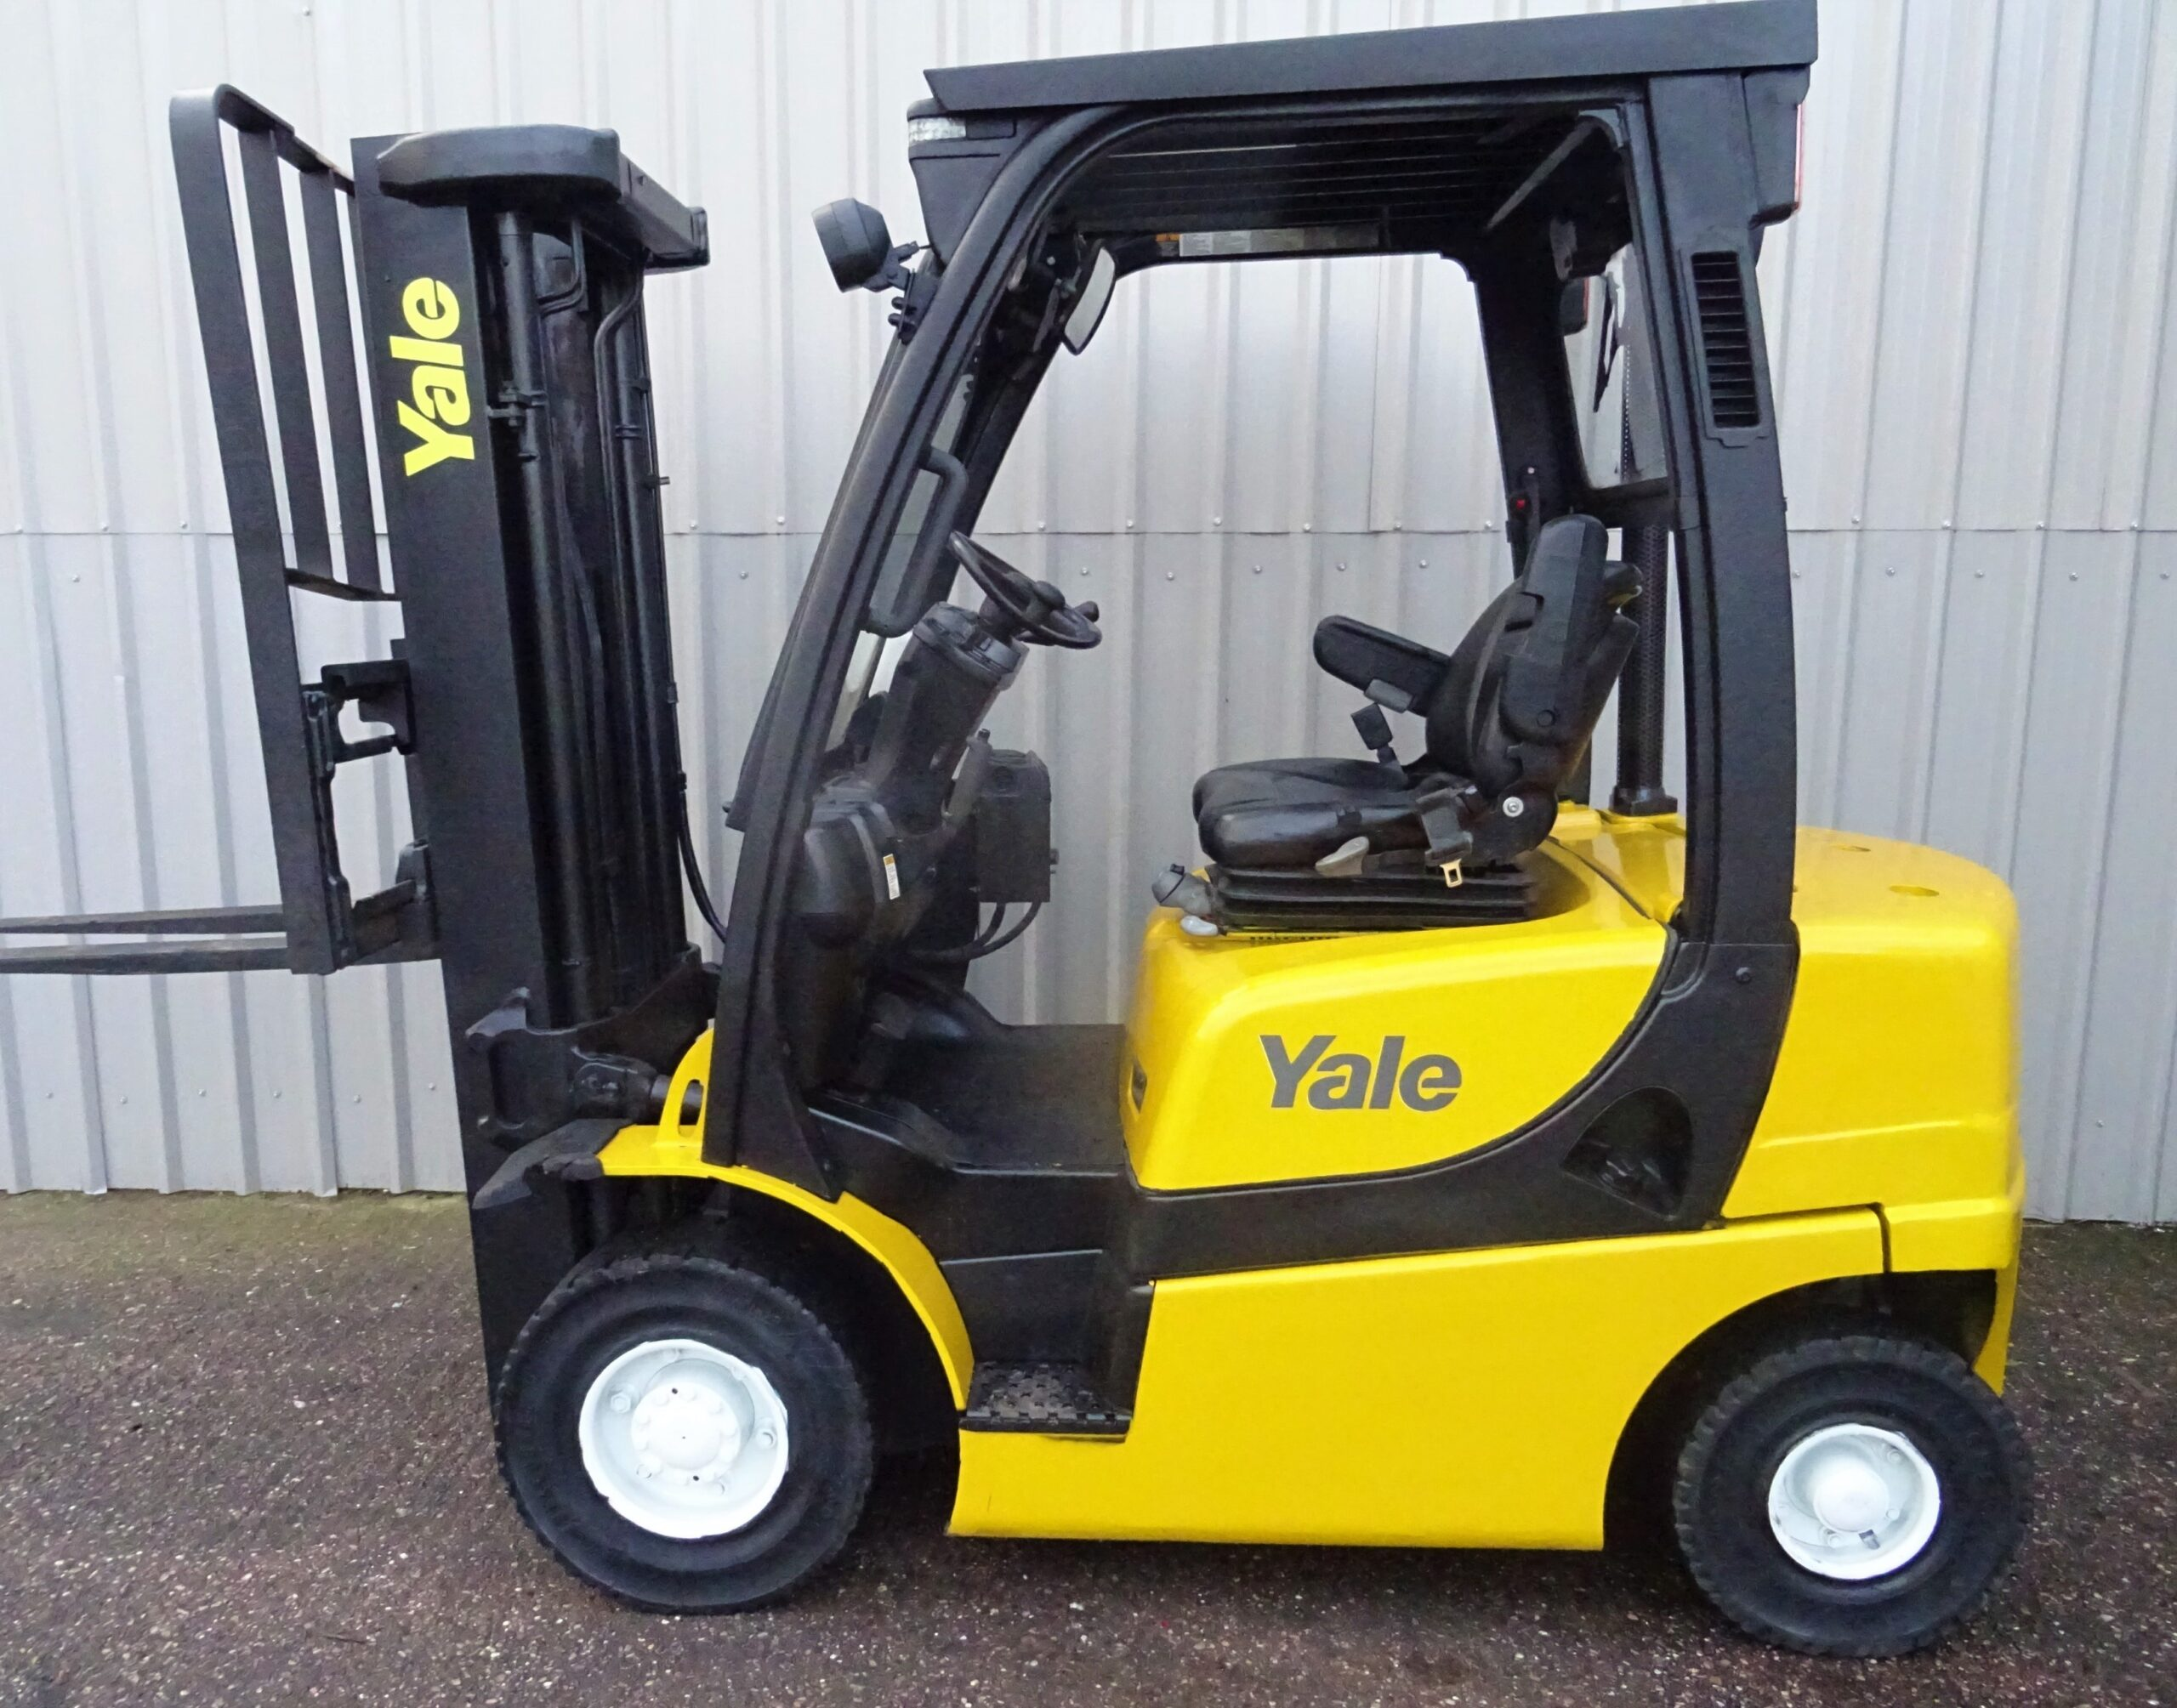 yale gdp20vx serial B26051L #2587 (1)